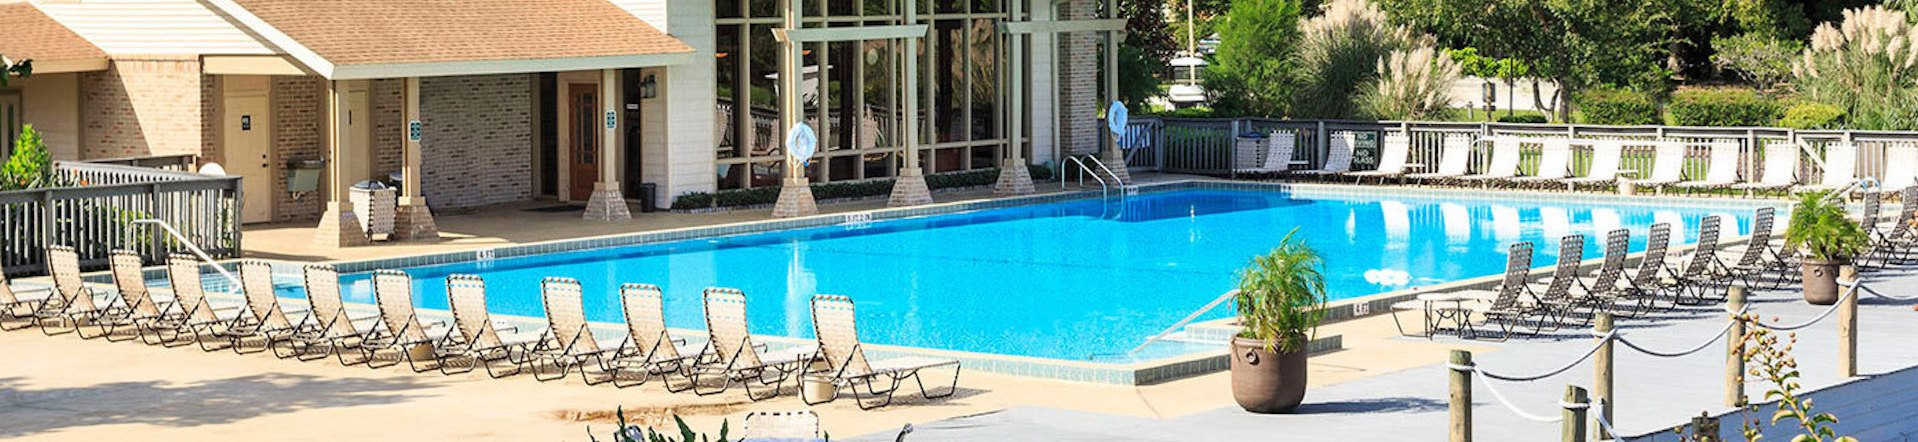 Sanford Landing Apartments Sparkling Pool Banner Image